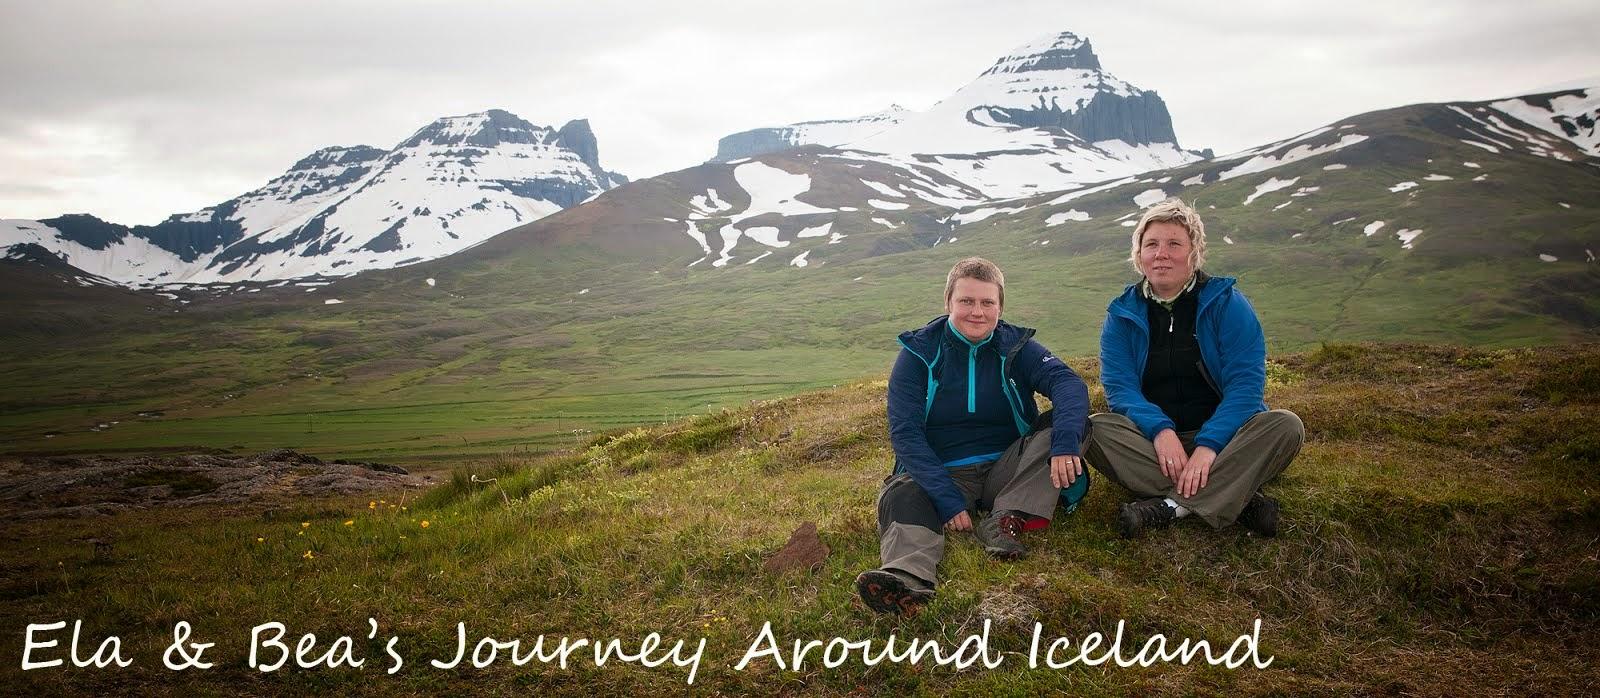 ELA & BEA'S JOURNEY AROUND ICELAND